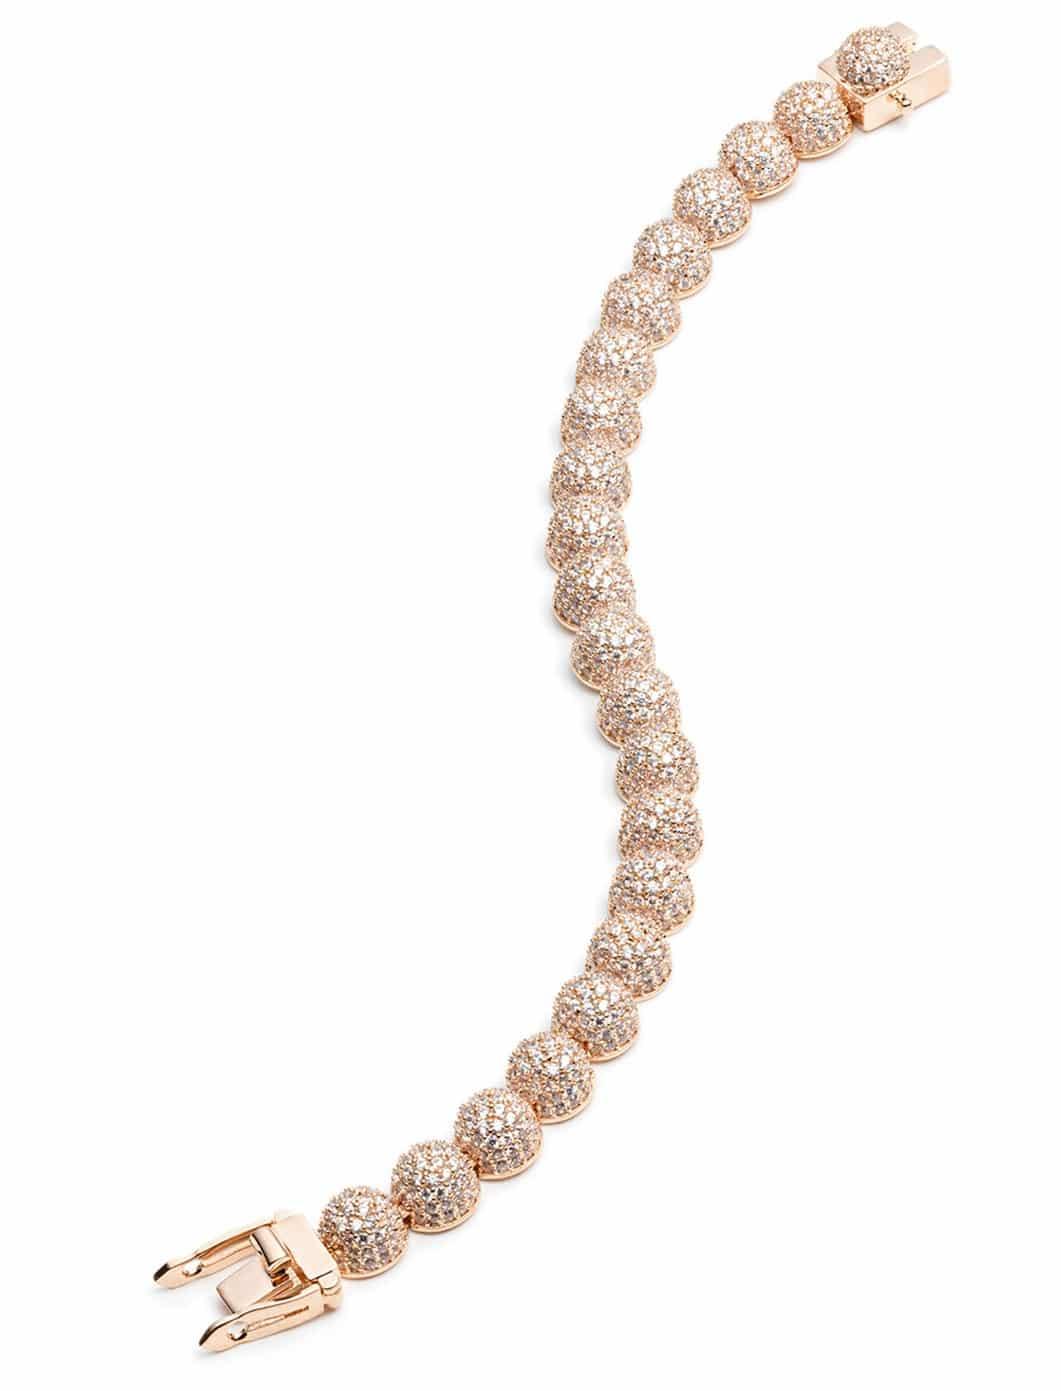 ny2016-gift-eddie-borgo-medium-pave-crystal-dome-link-bracelet